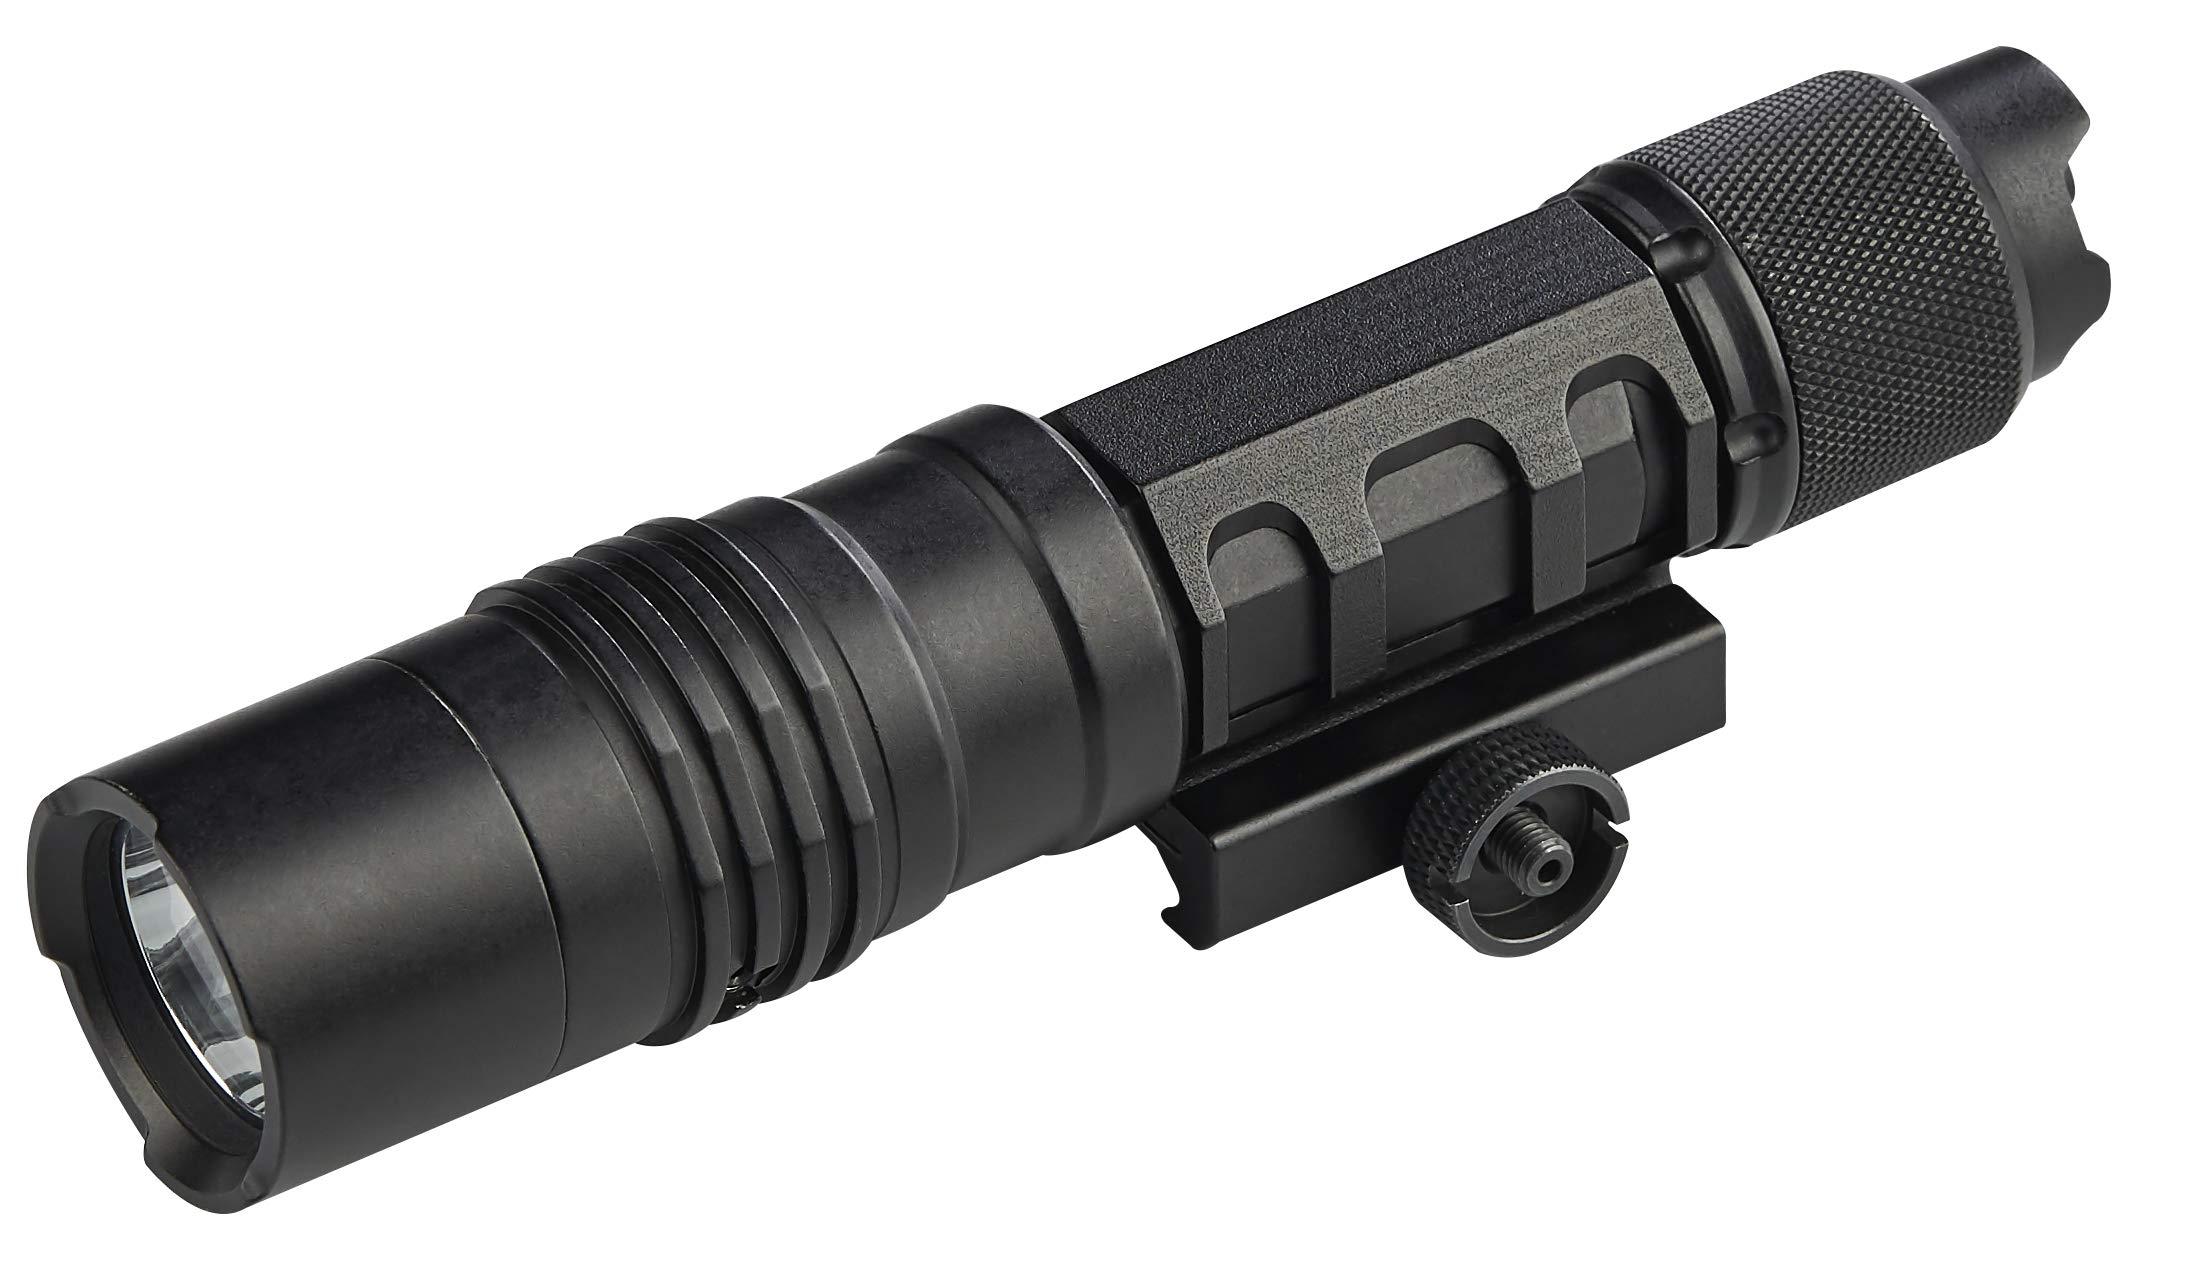 Streamlight 88089 ProTac Rail Mount HL-X Laser with CR123A Lithium Batteries - 1000 Lumens,Black